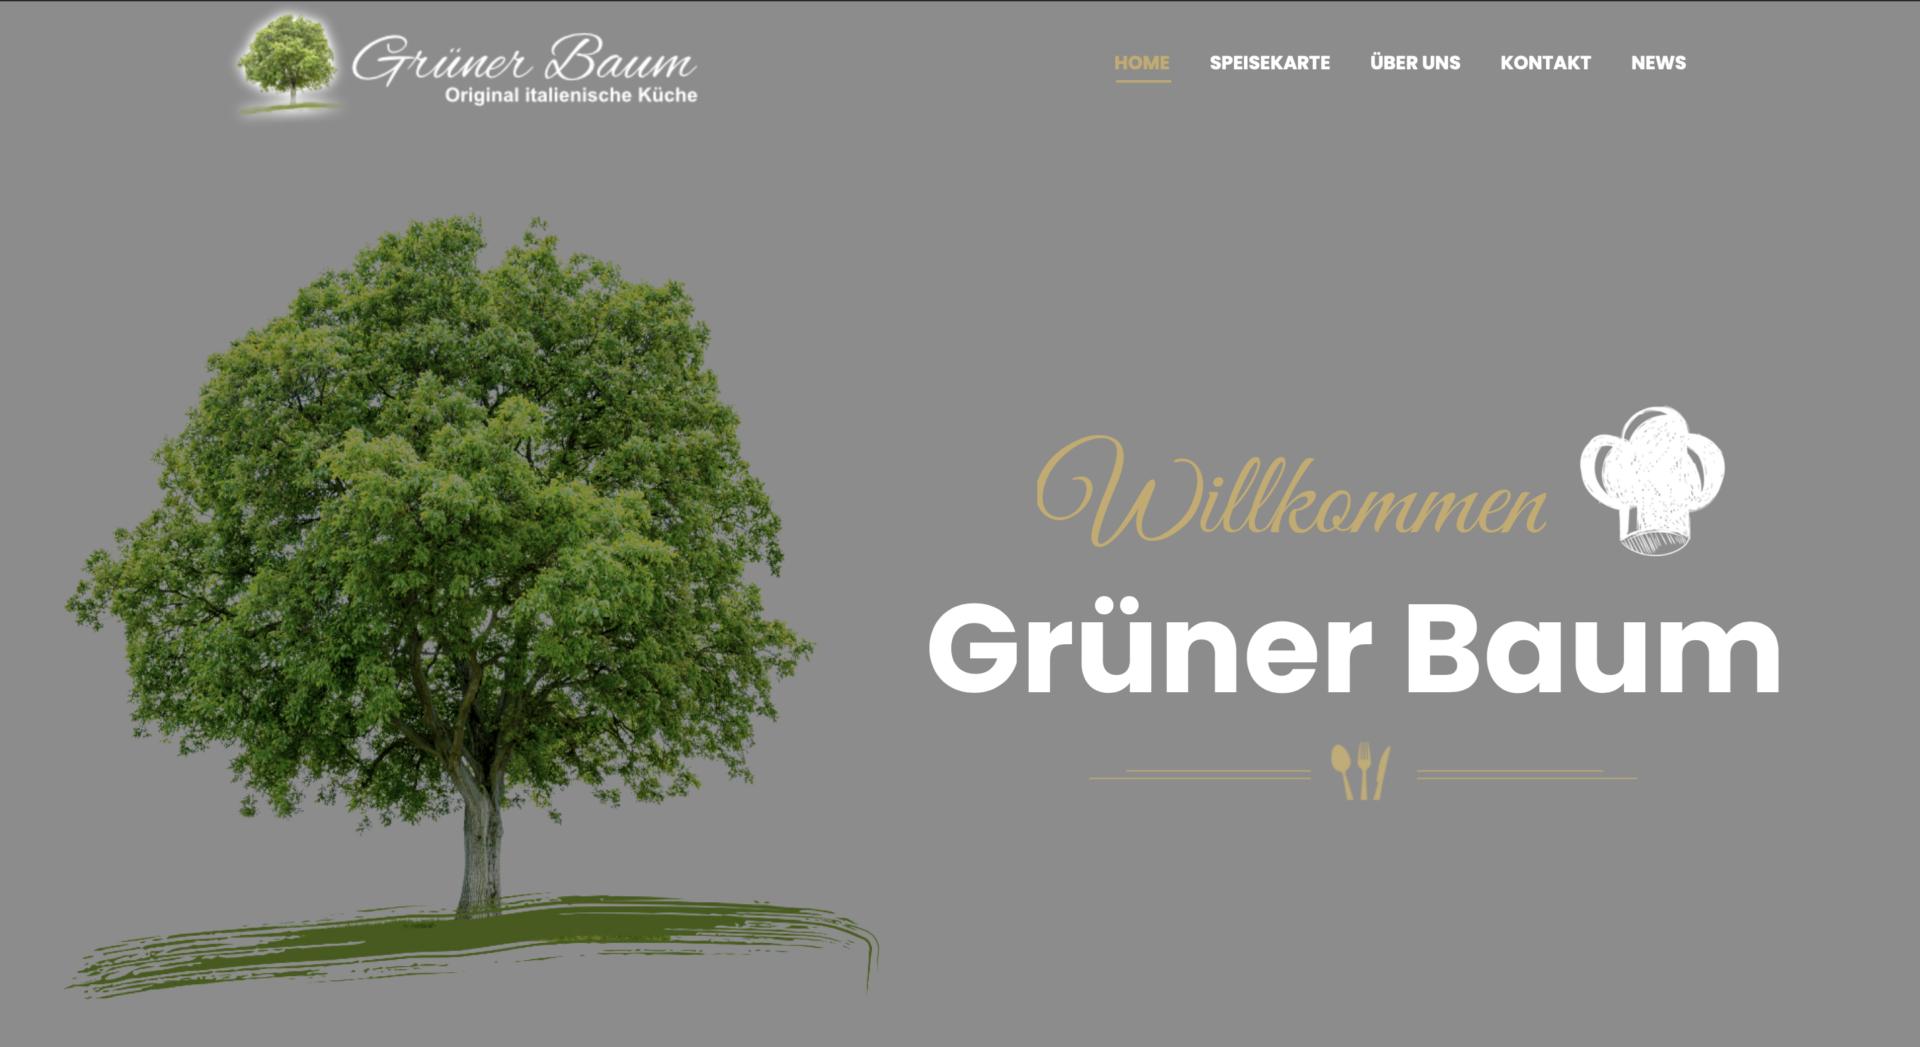 Grüner Baum PLANB Restaurant